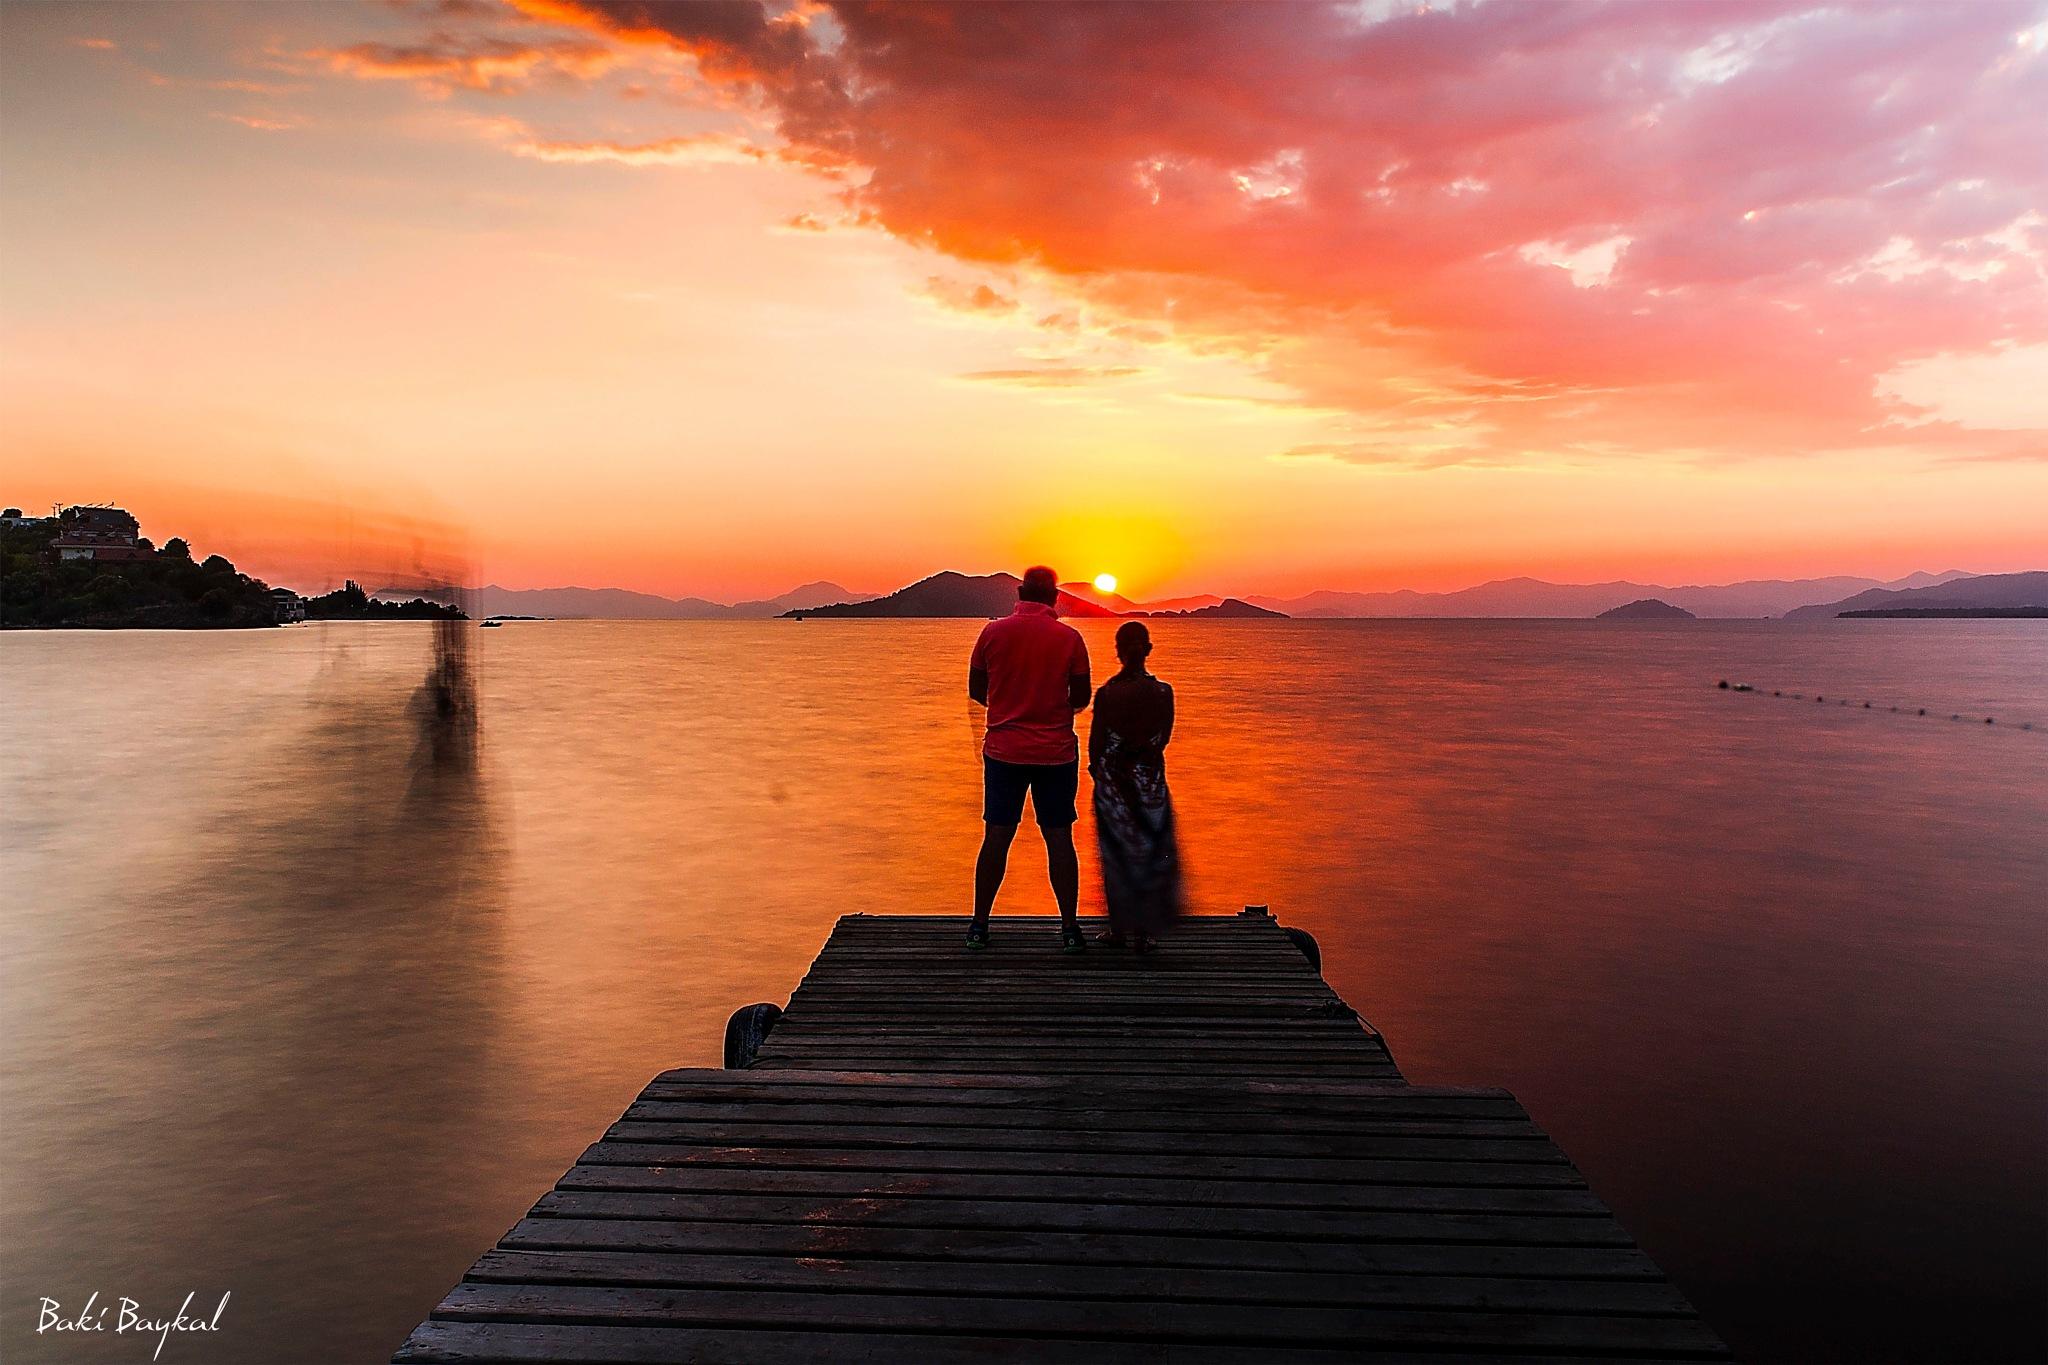 Sunset lovers. by Baki Baykal